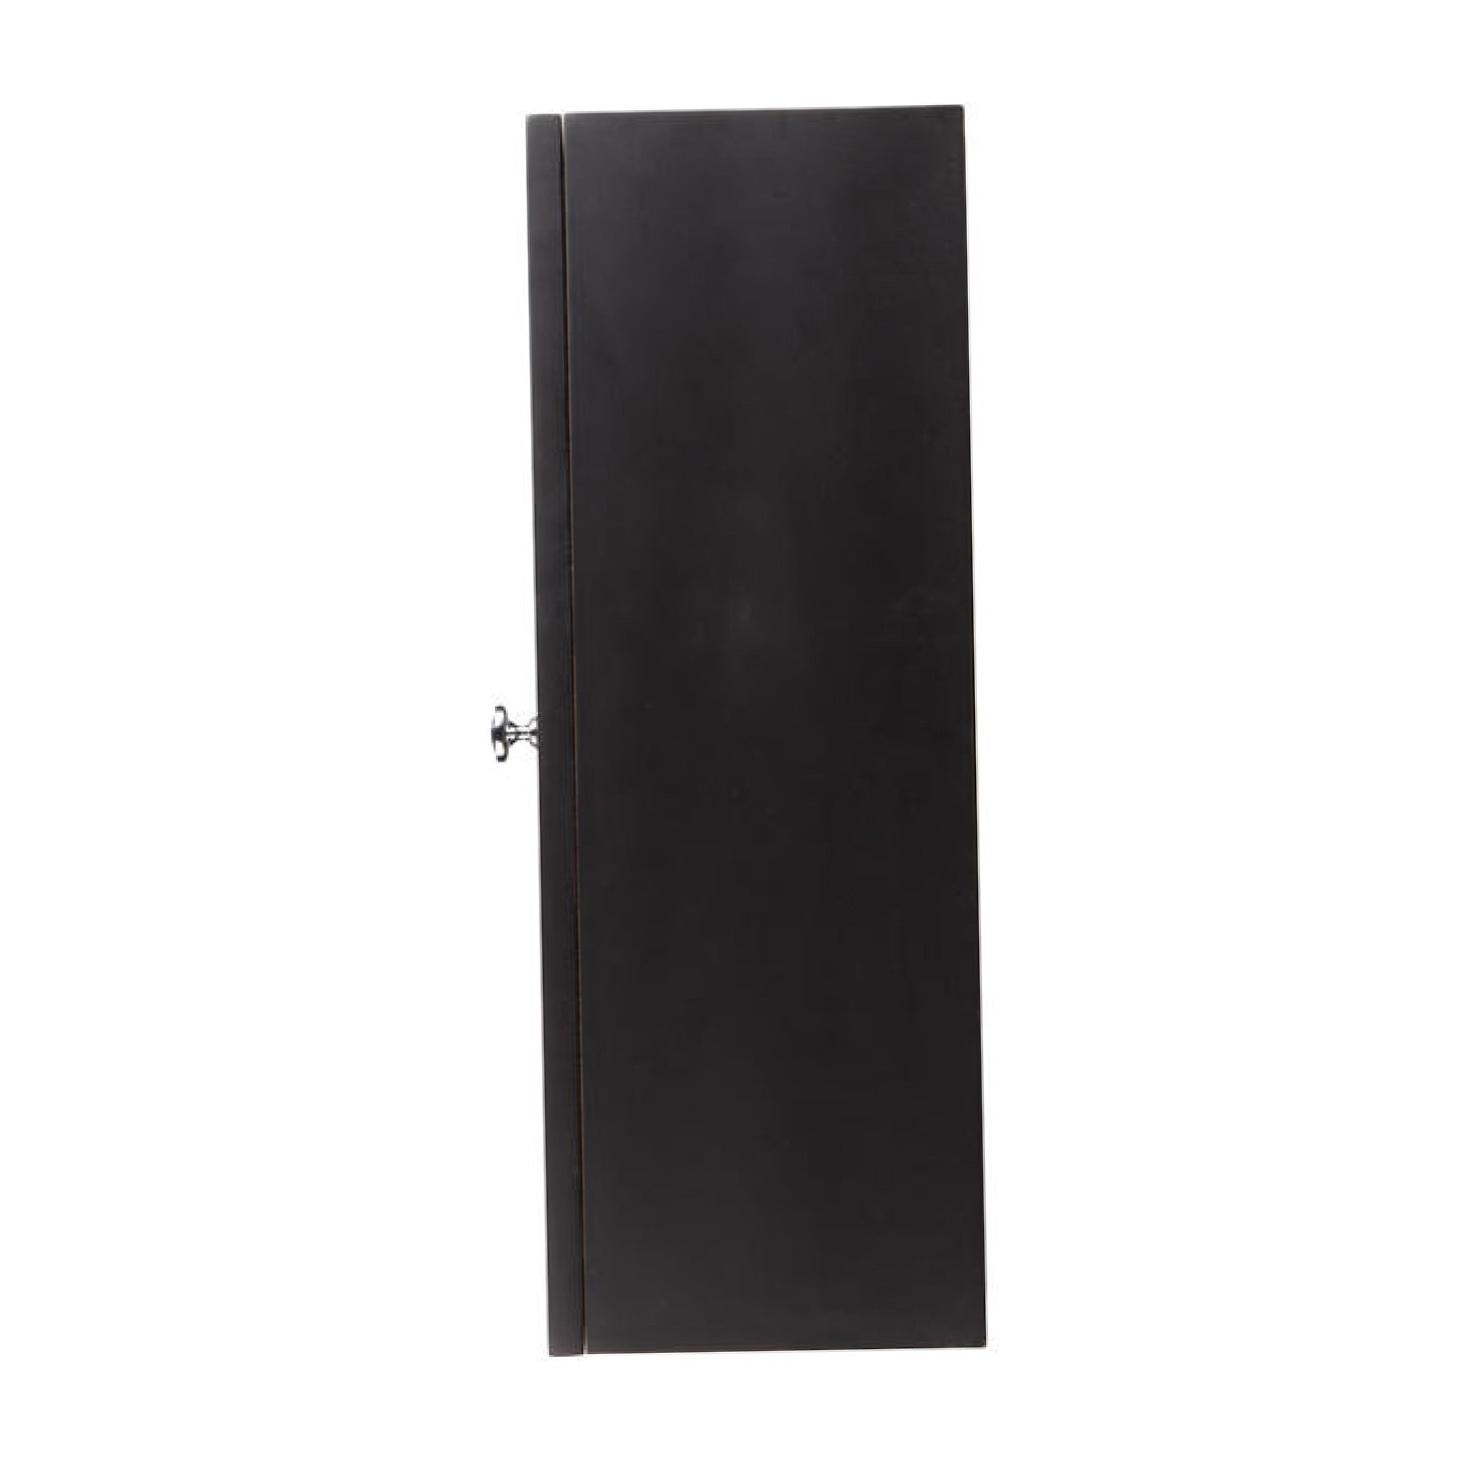 Black Medicine Cabinet Without Mirror